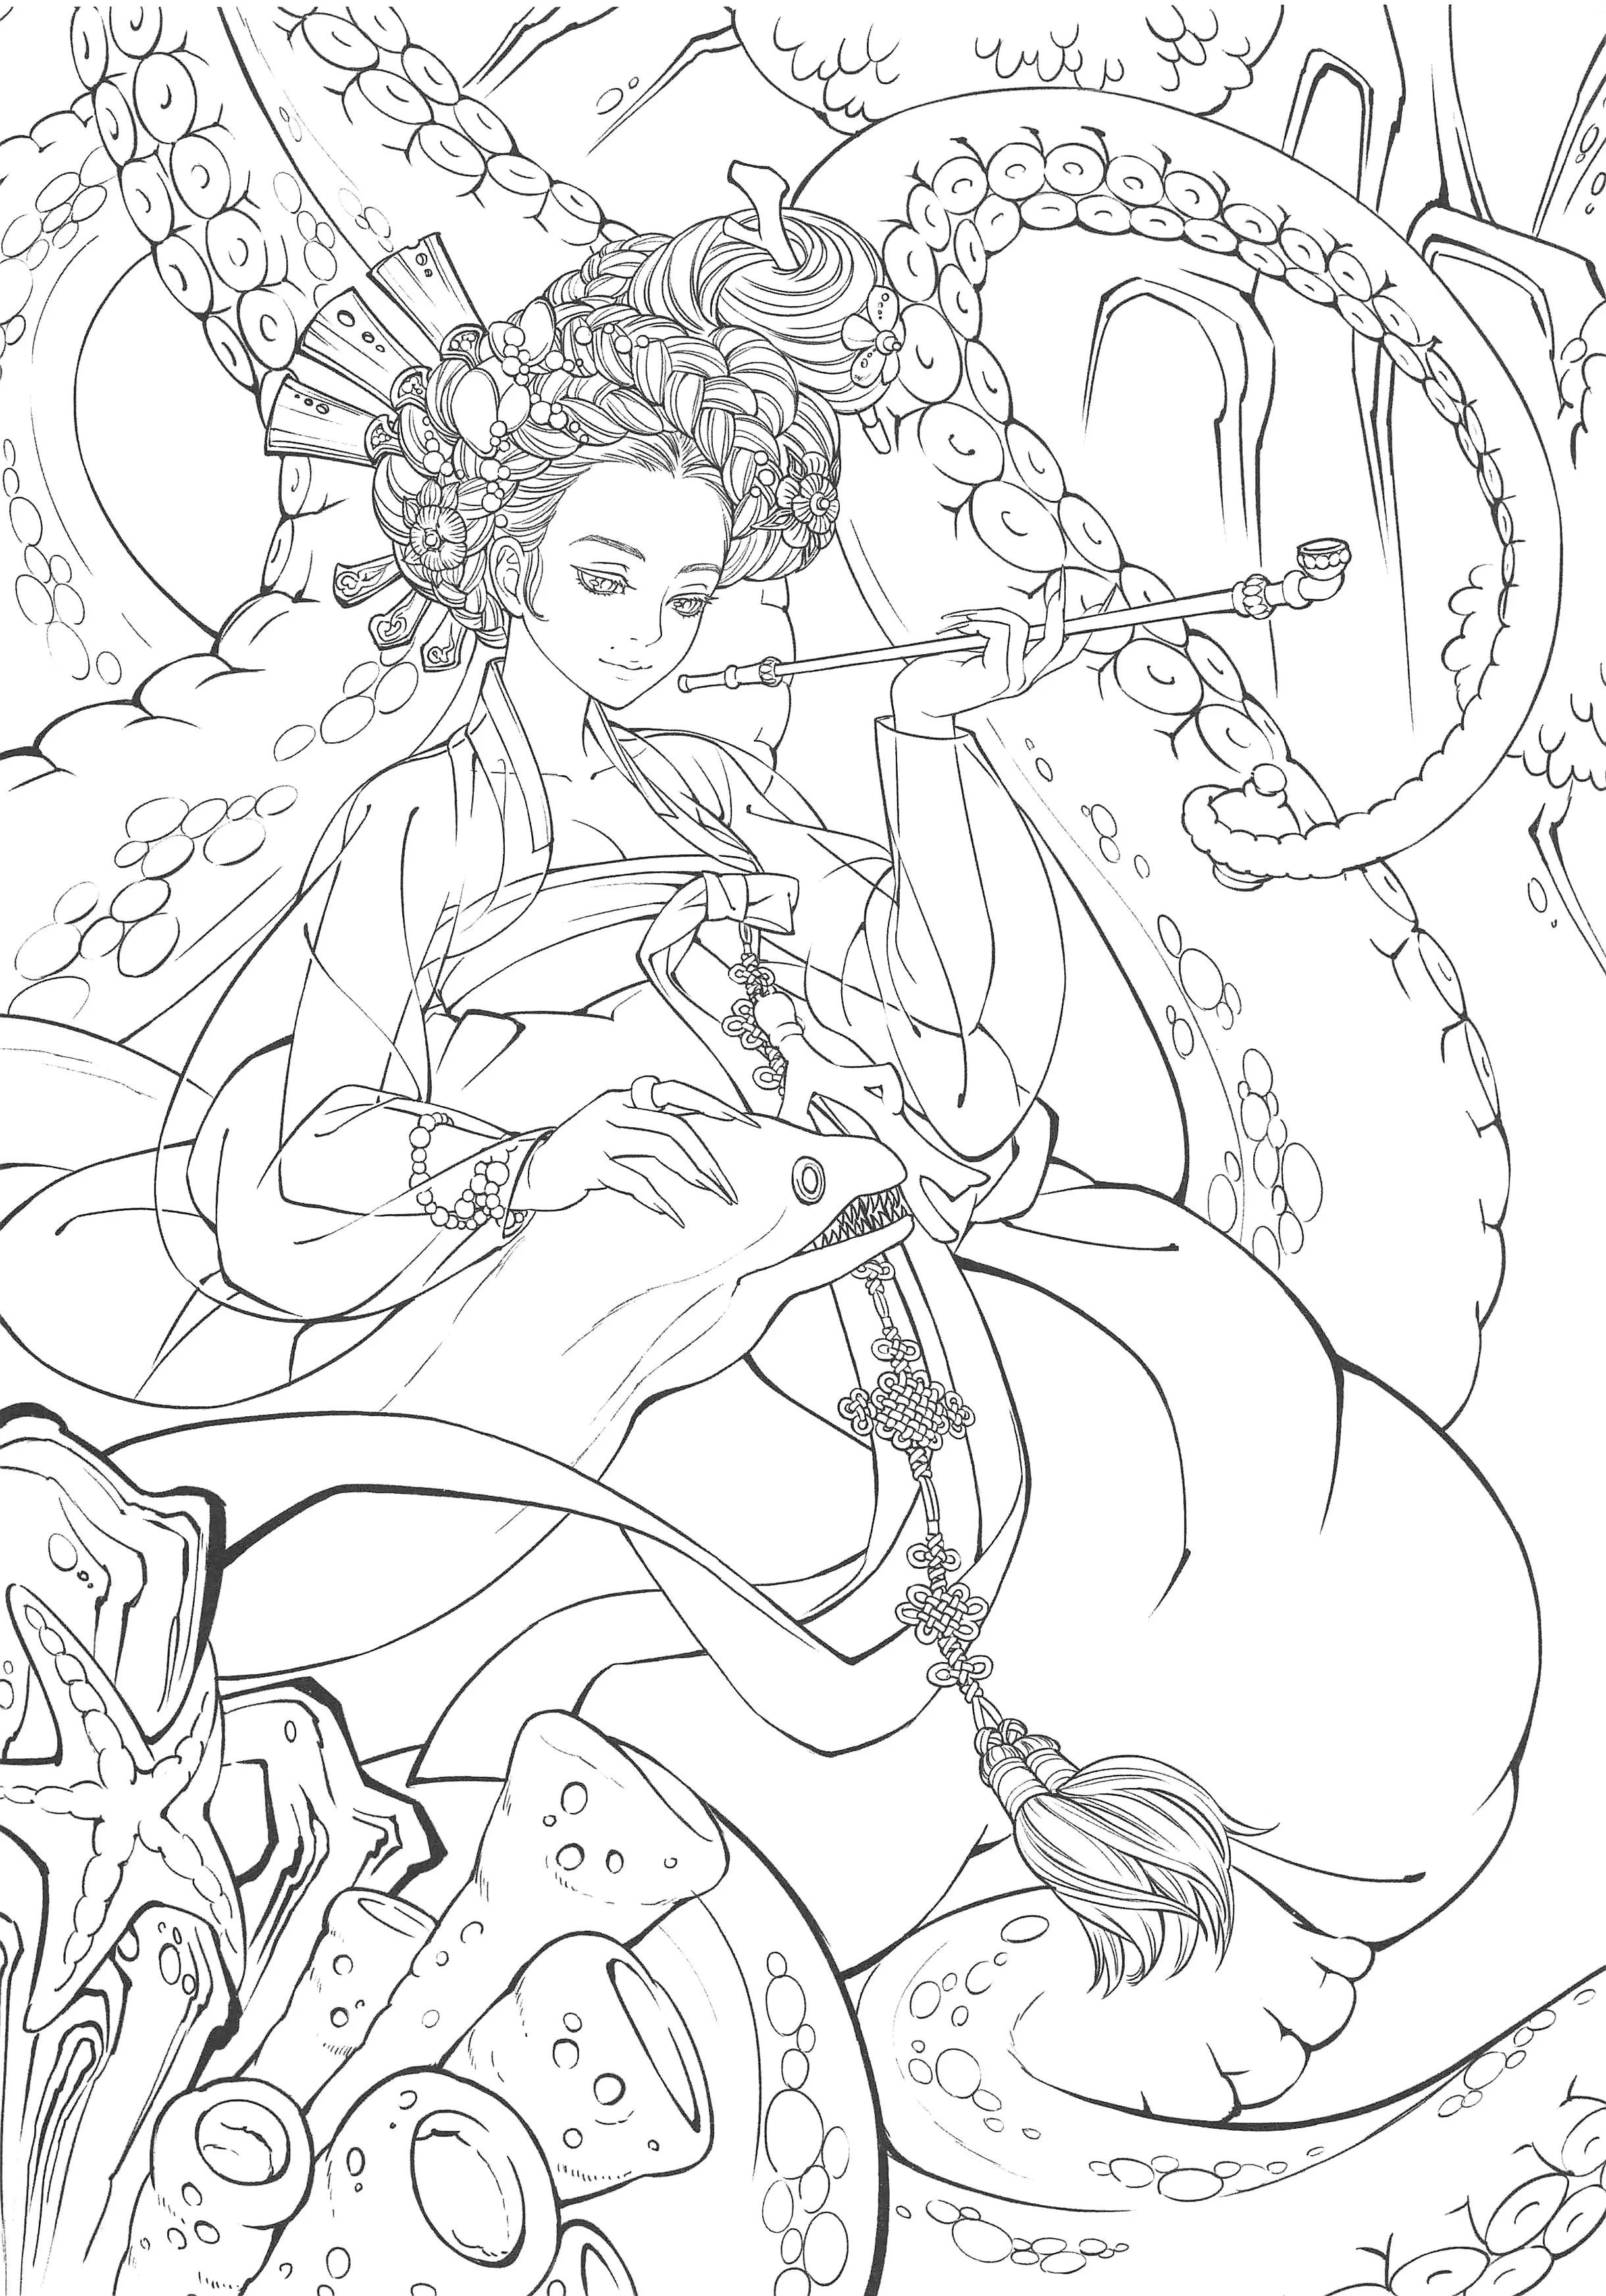 324. Korean Fairy Tales Coloring Book Vol. 1